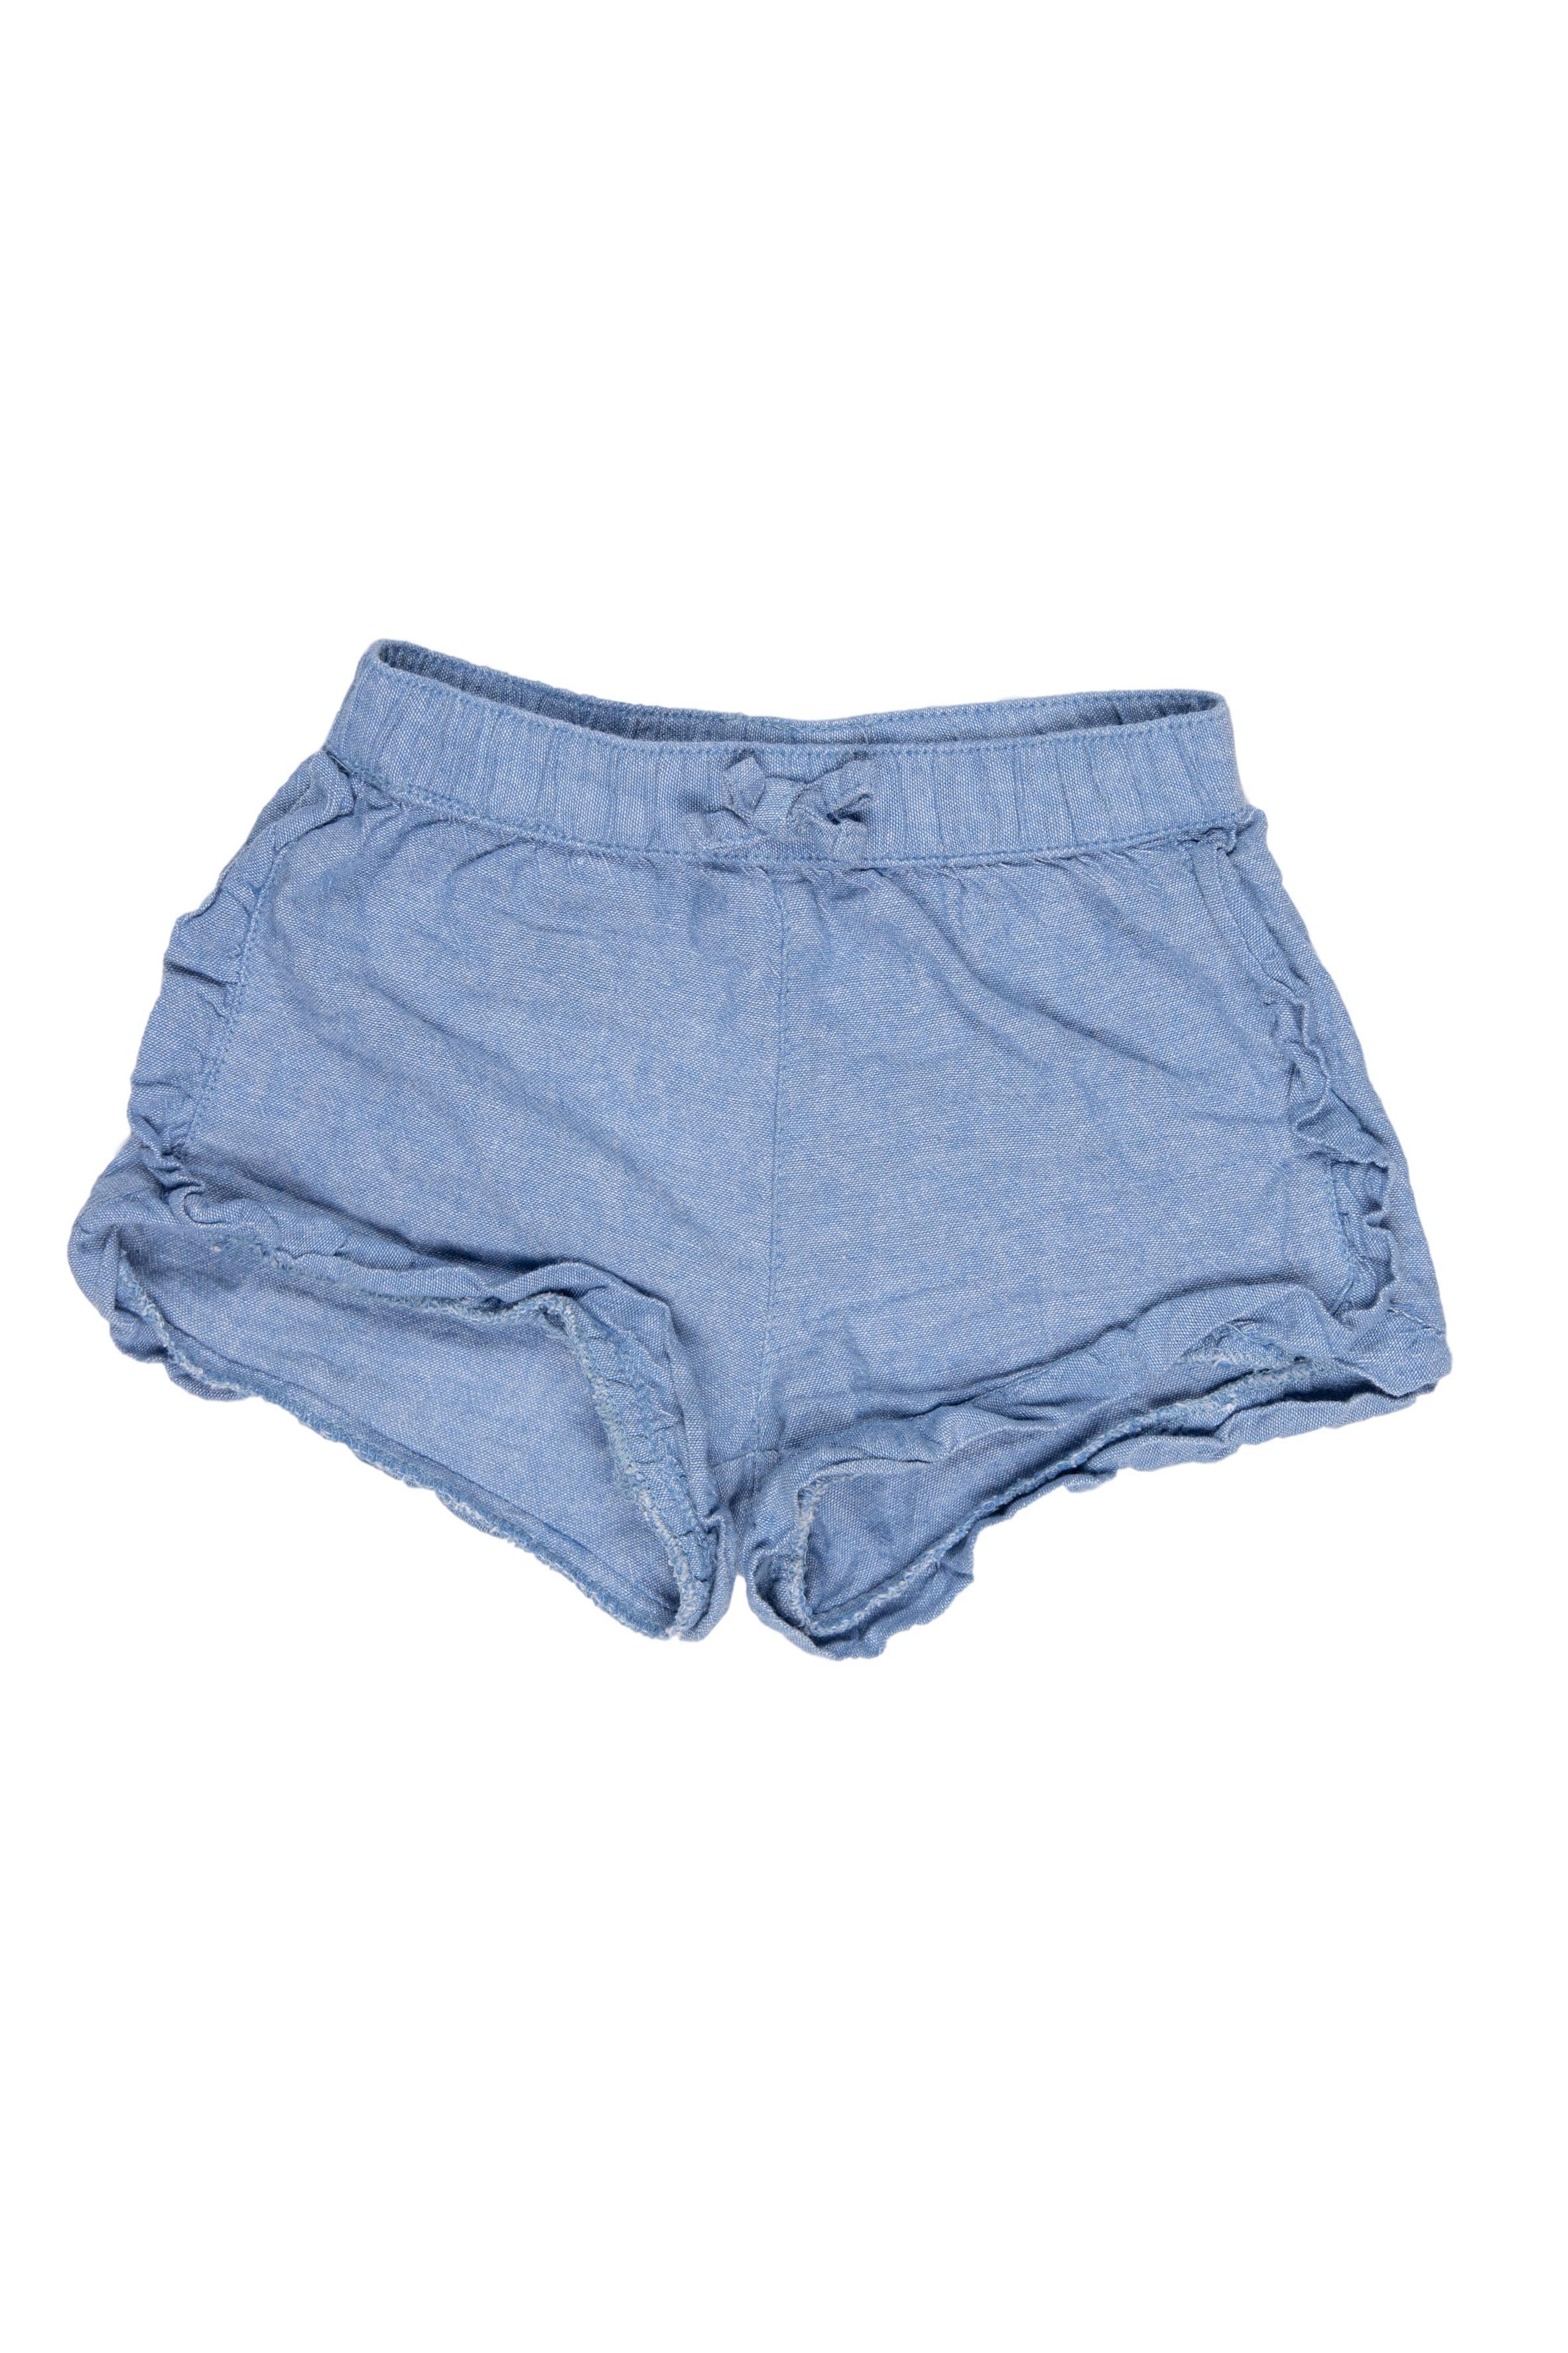 Short de tela simil jean 100% algodón - Yamp